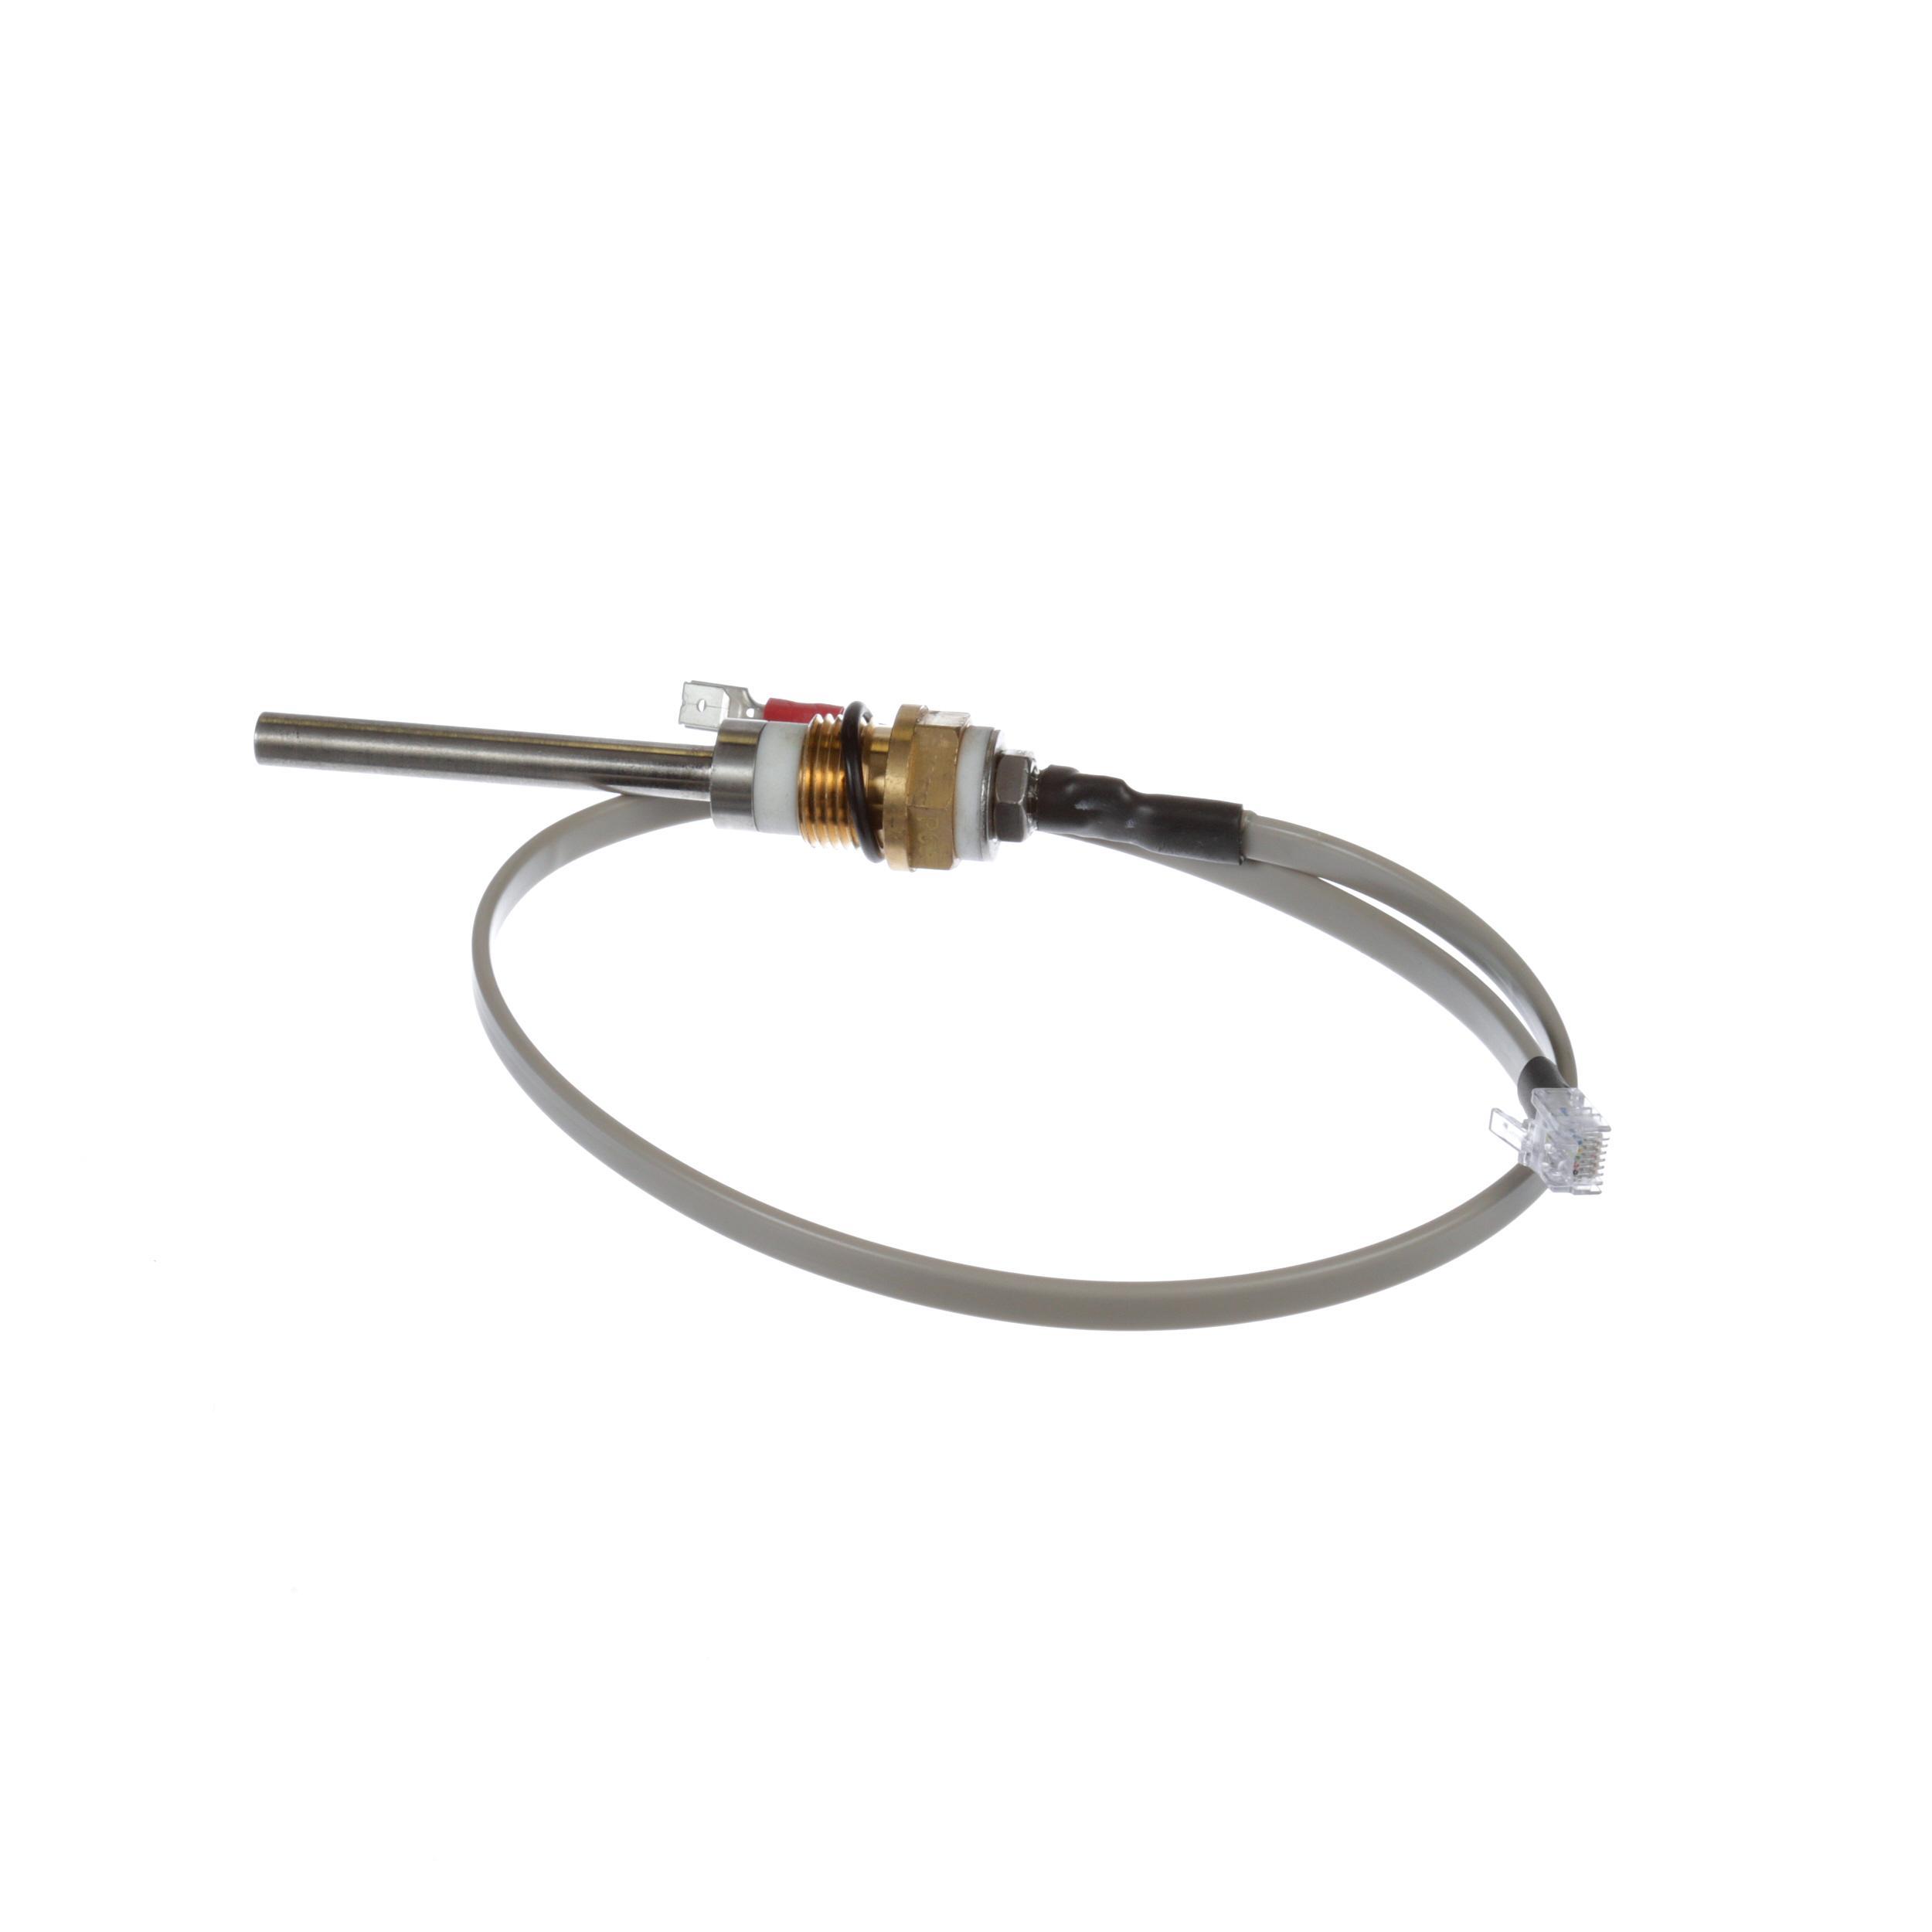 Hubbell Probe Sensor